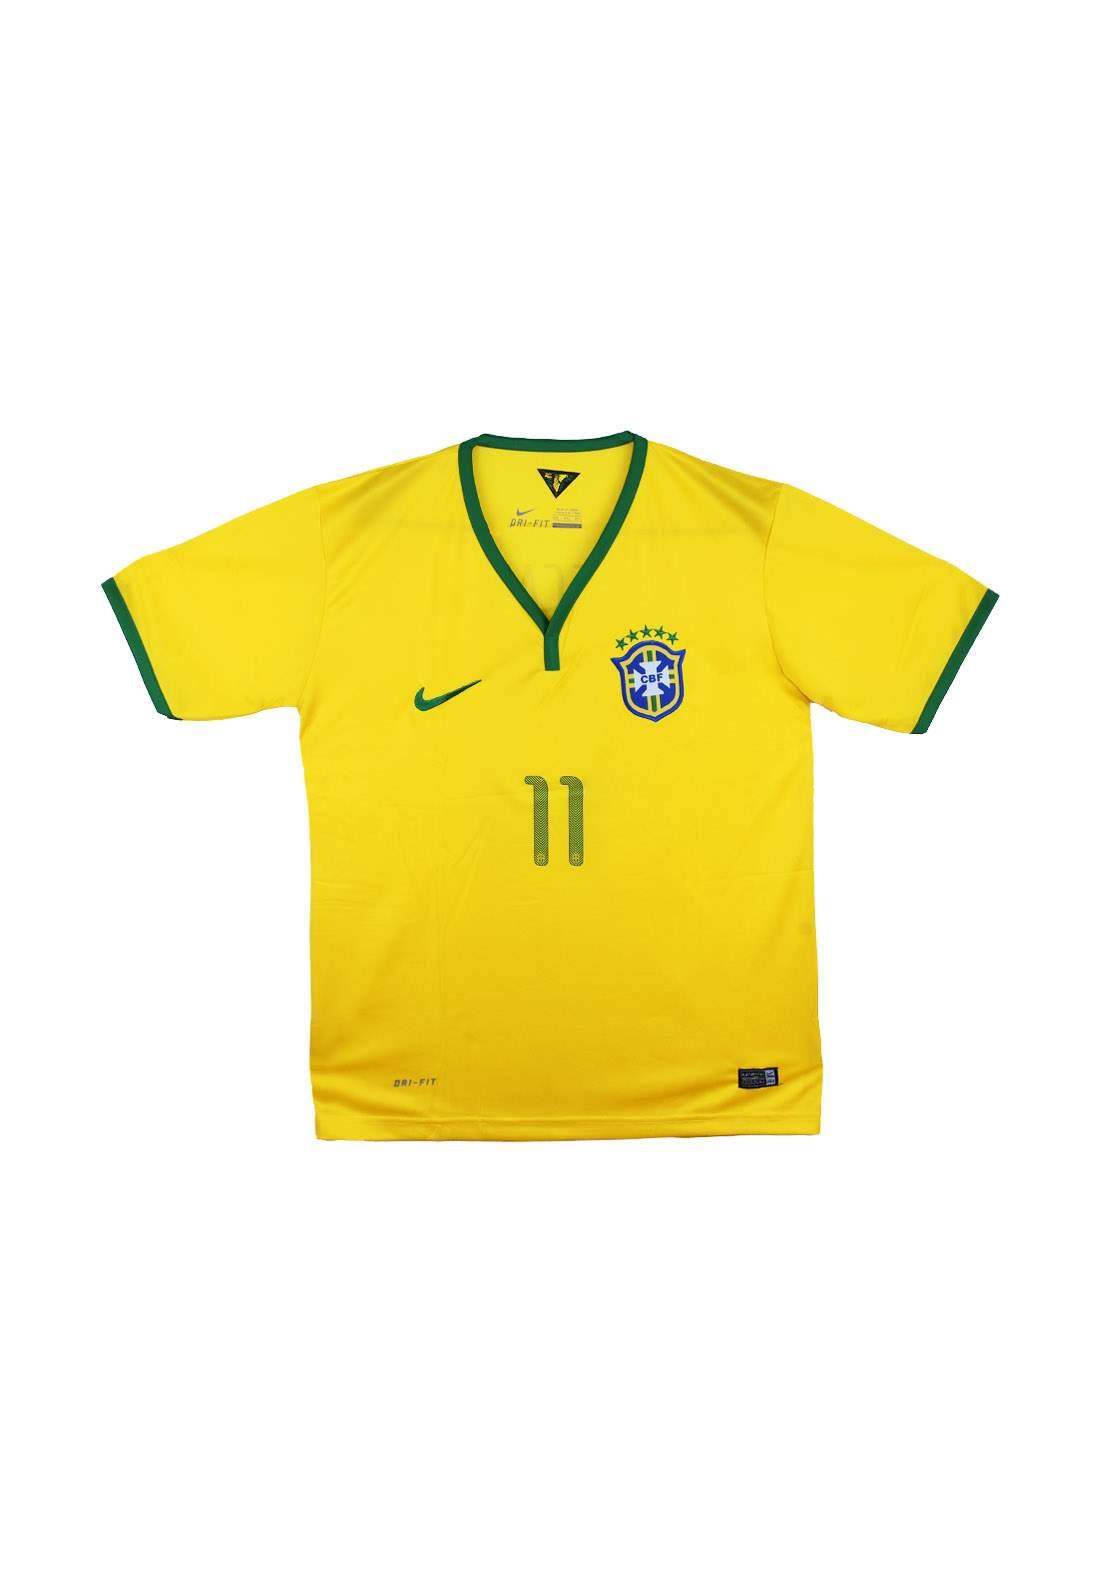 تيشيرت رياضي رجالي فريق برازيل اصفر اللون